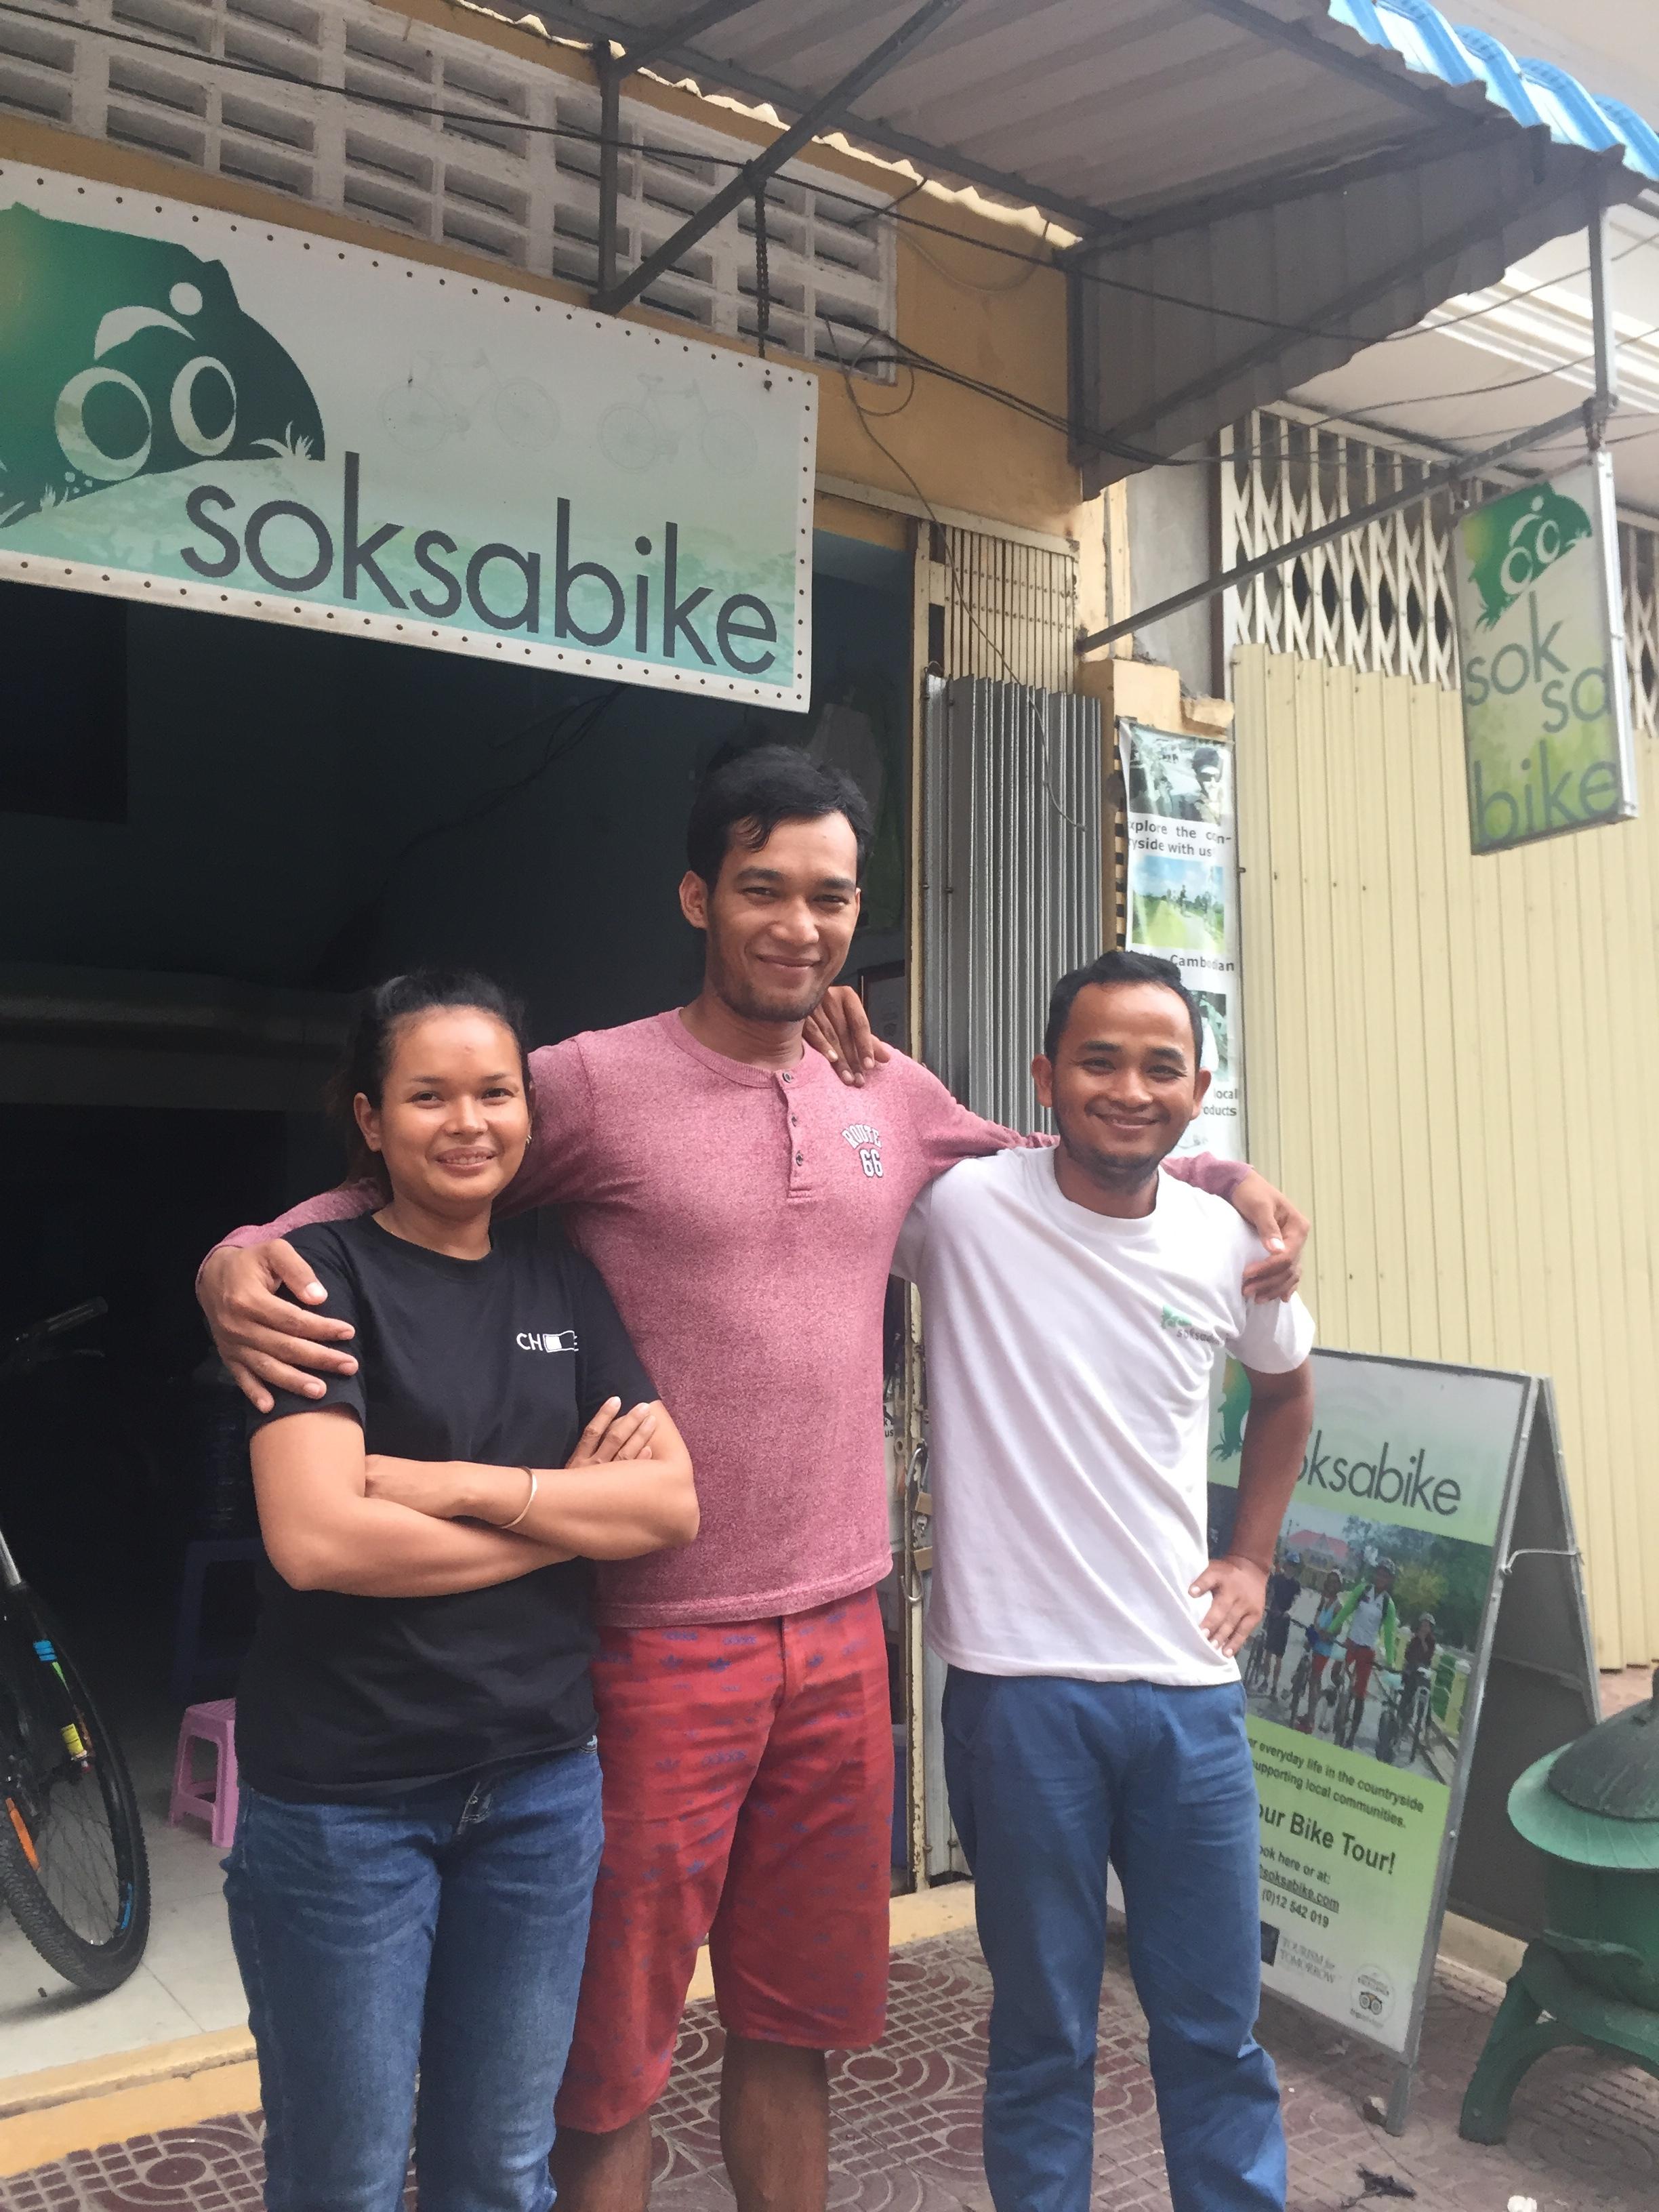 Mony, Kanha, and Phalla - Soksabike's new owners